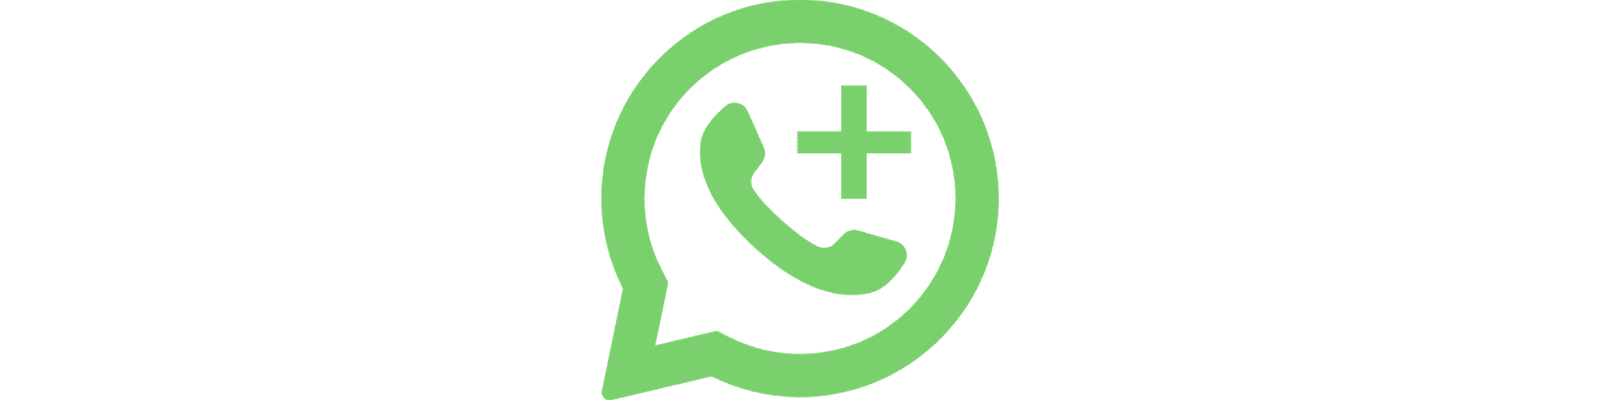 واتس اب بلس + WhatsApp Plus